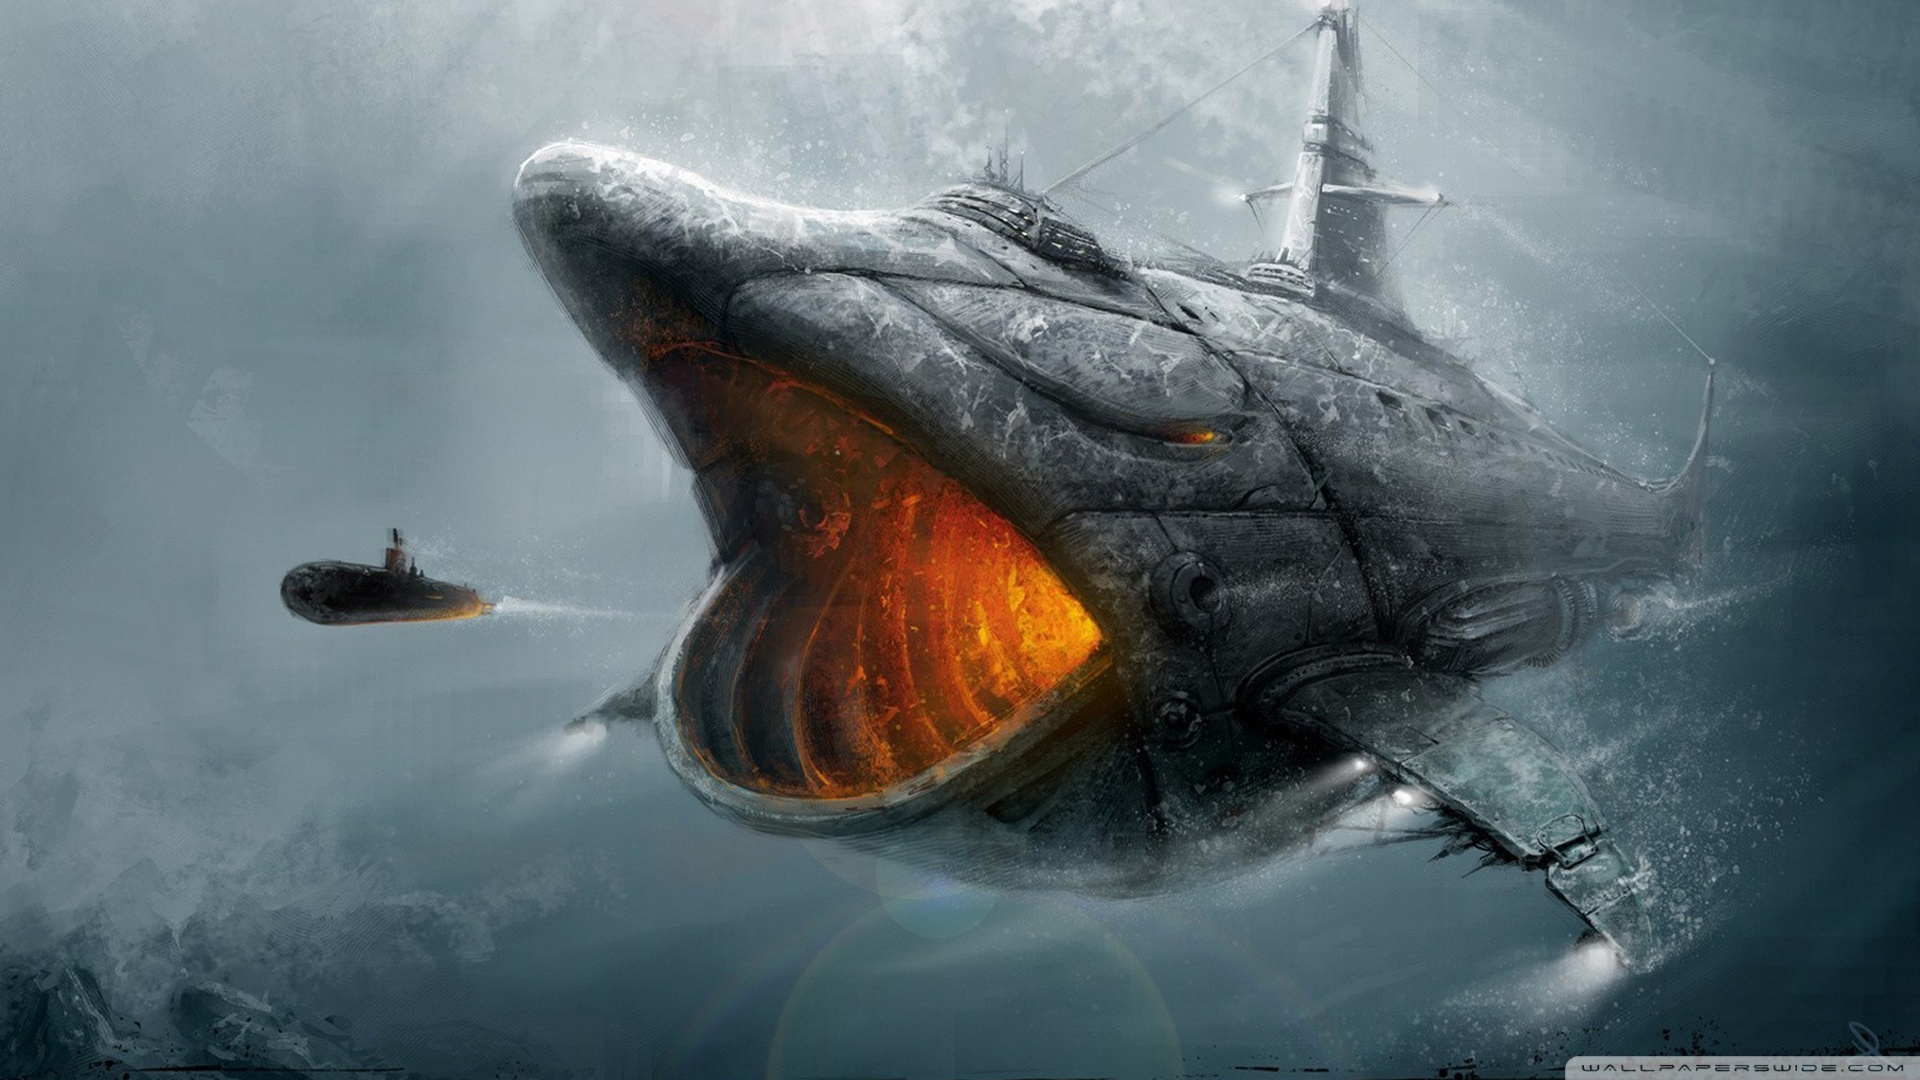 Download Fish Submarine Wallpaper 1920x1080 Wallpoper 1920x1080